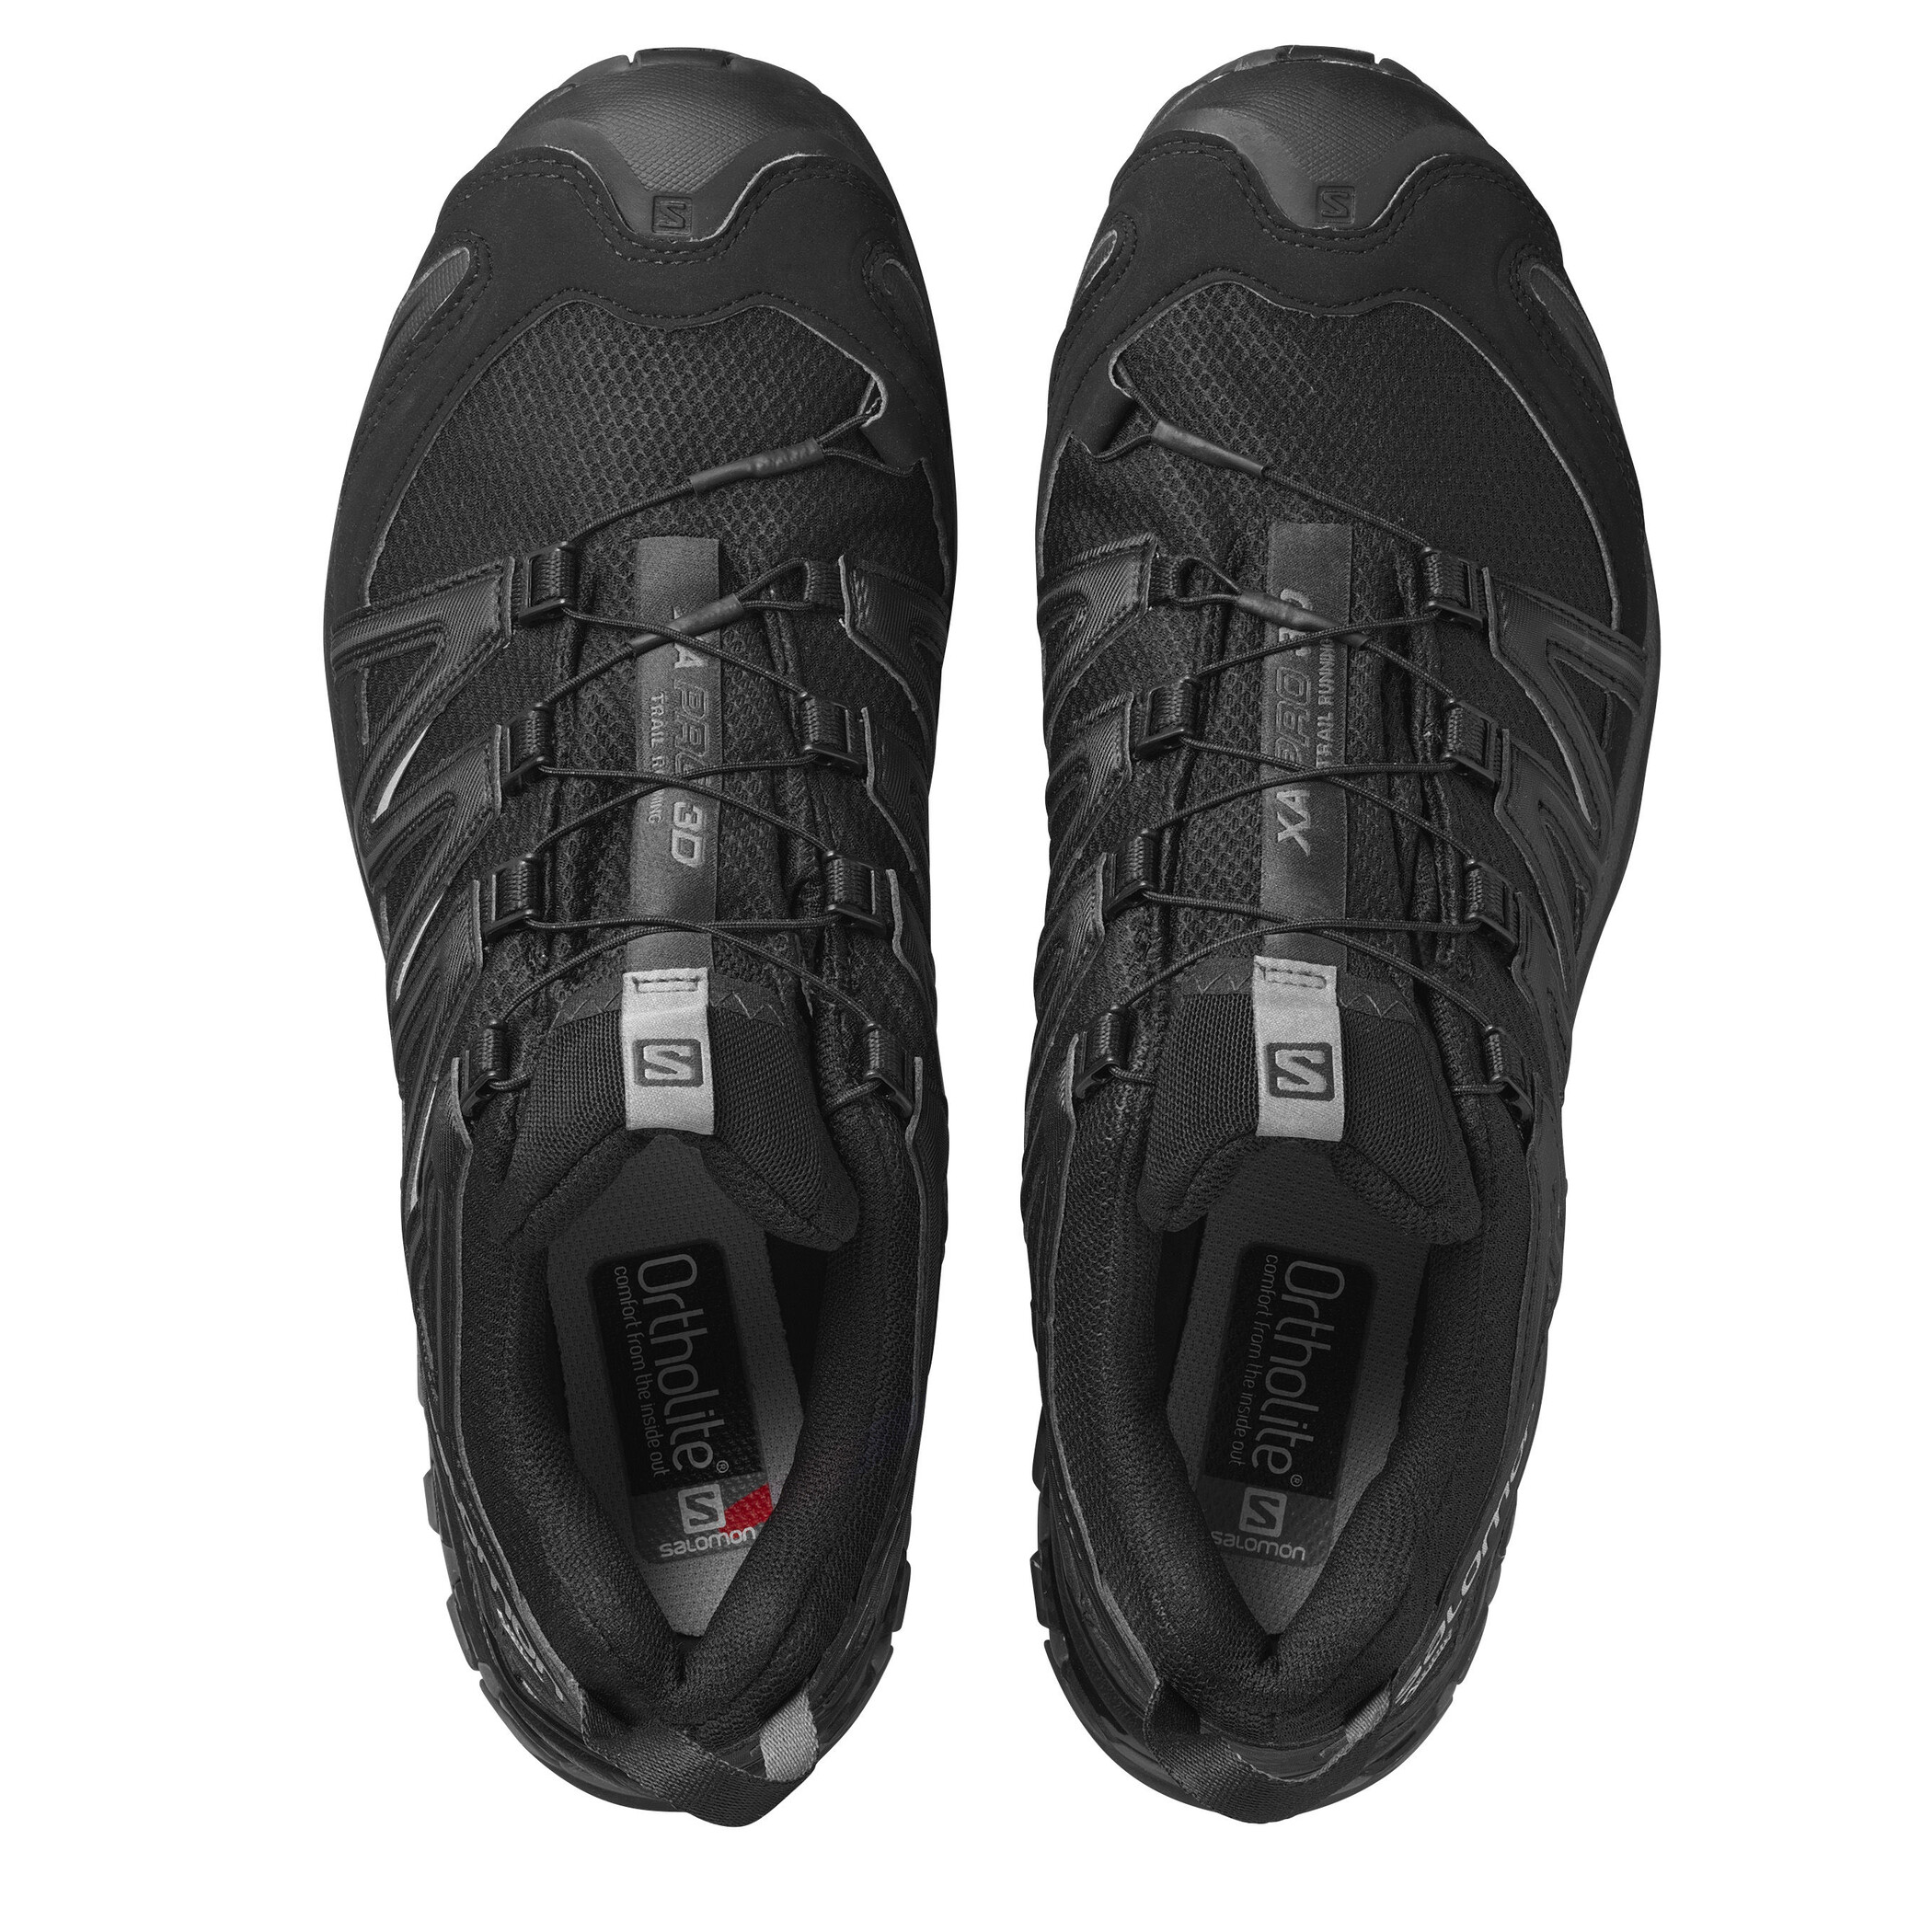 Salomon XA Pro 3D GTX Shoes Herr blackblackmagnet